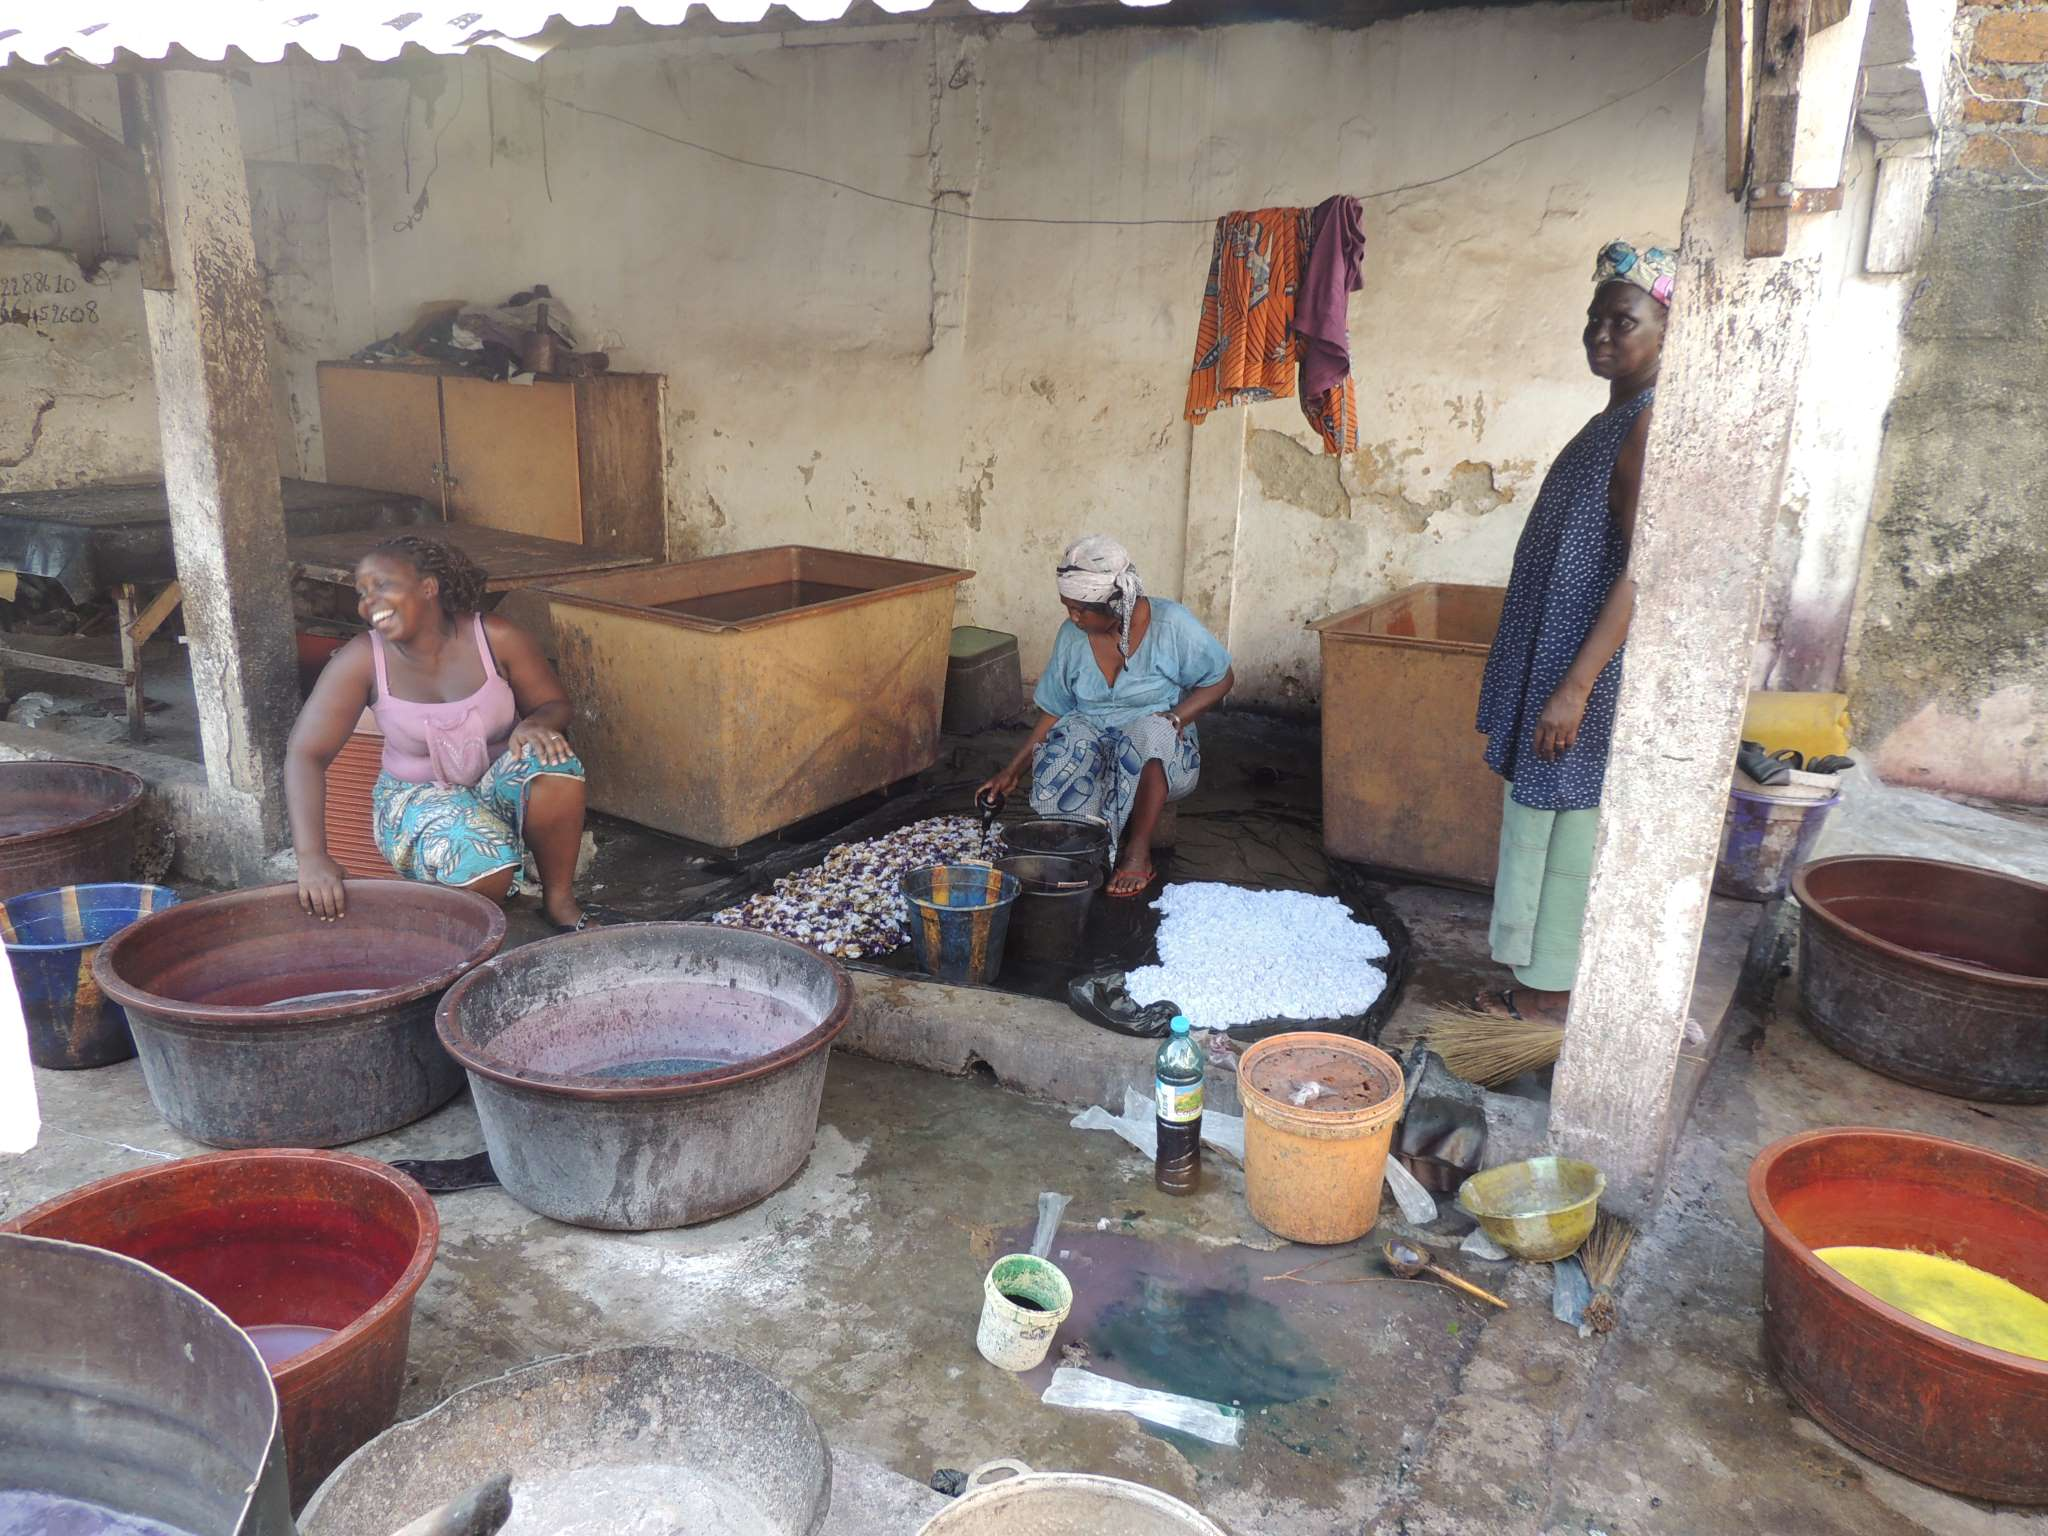 Atelier de teinture à Conakry